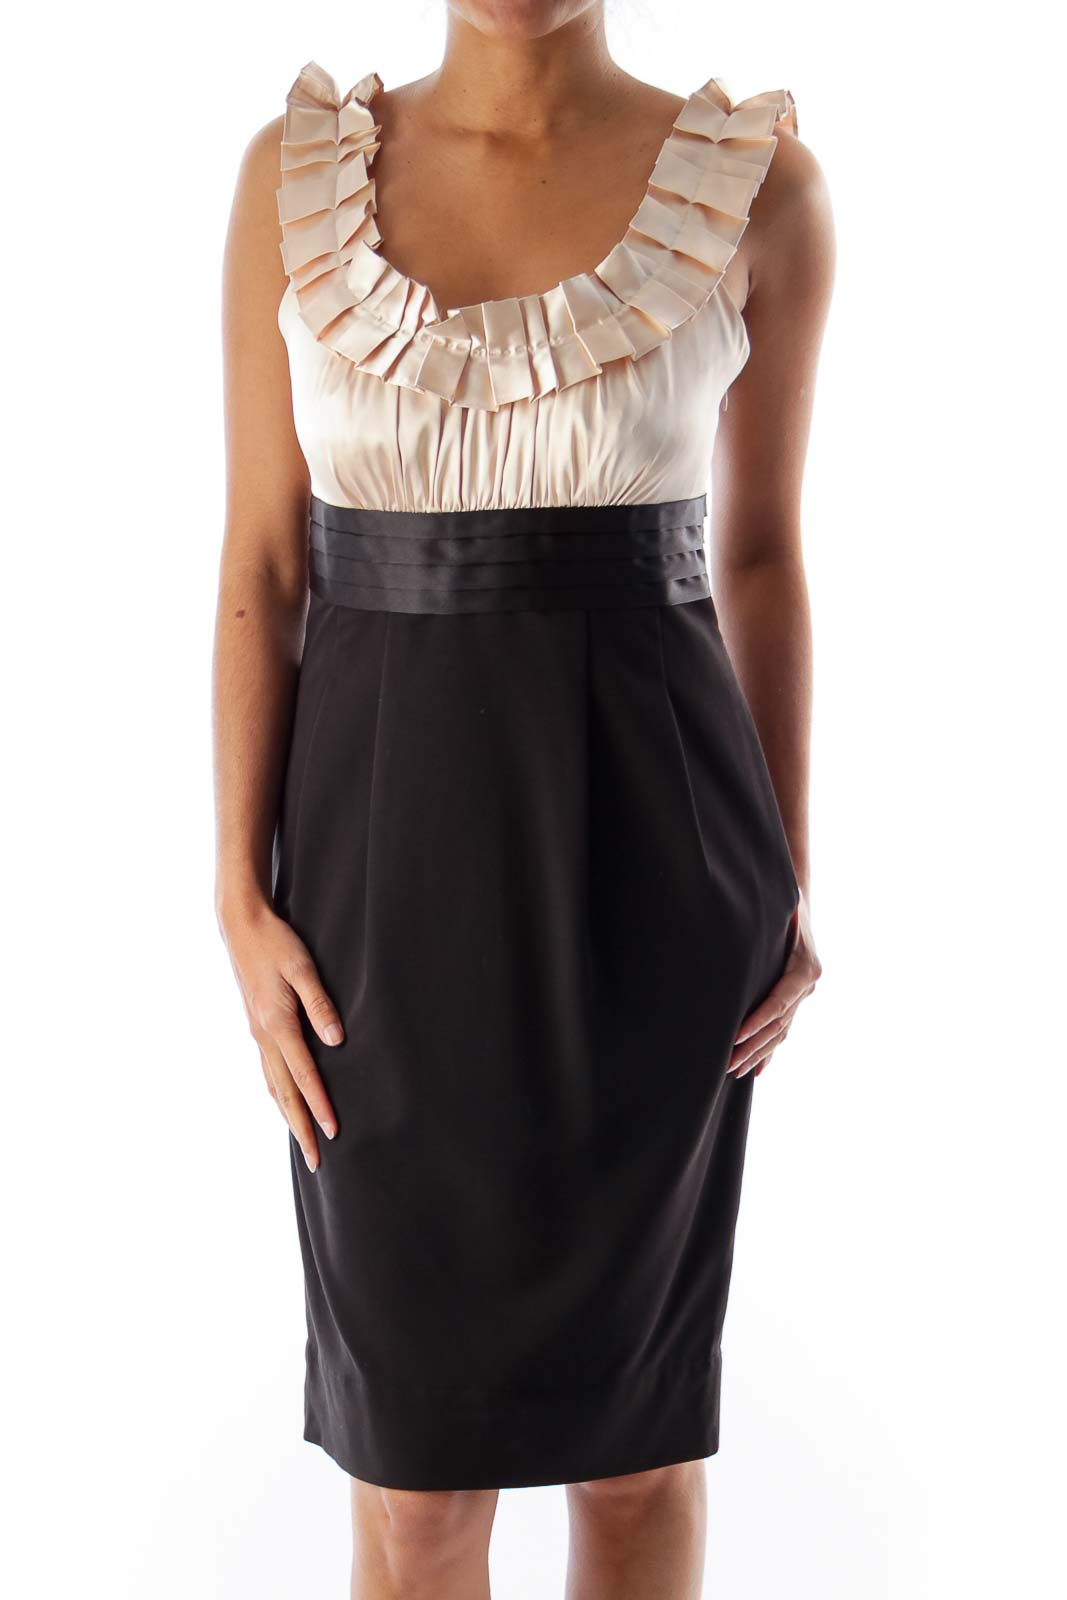 Beige & Black Ruffle Dress